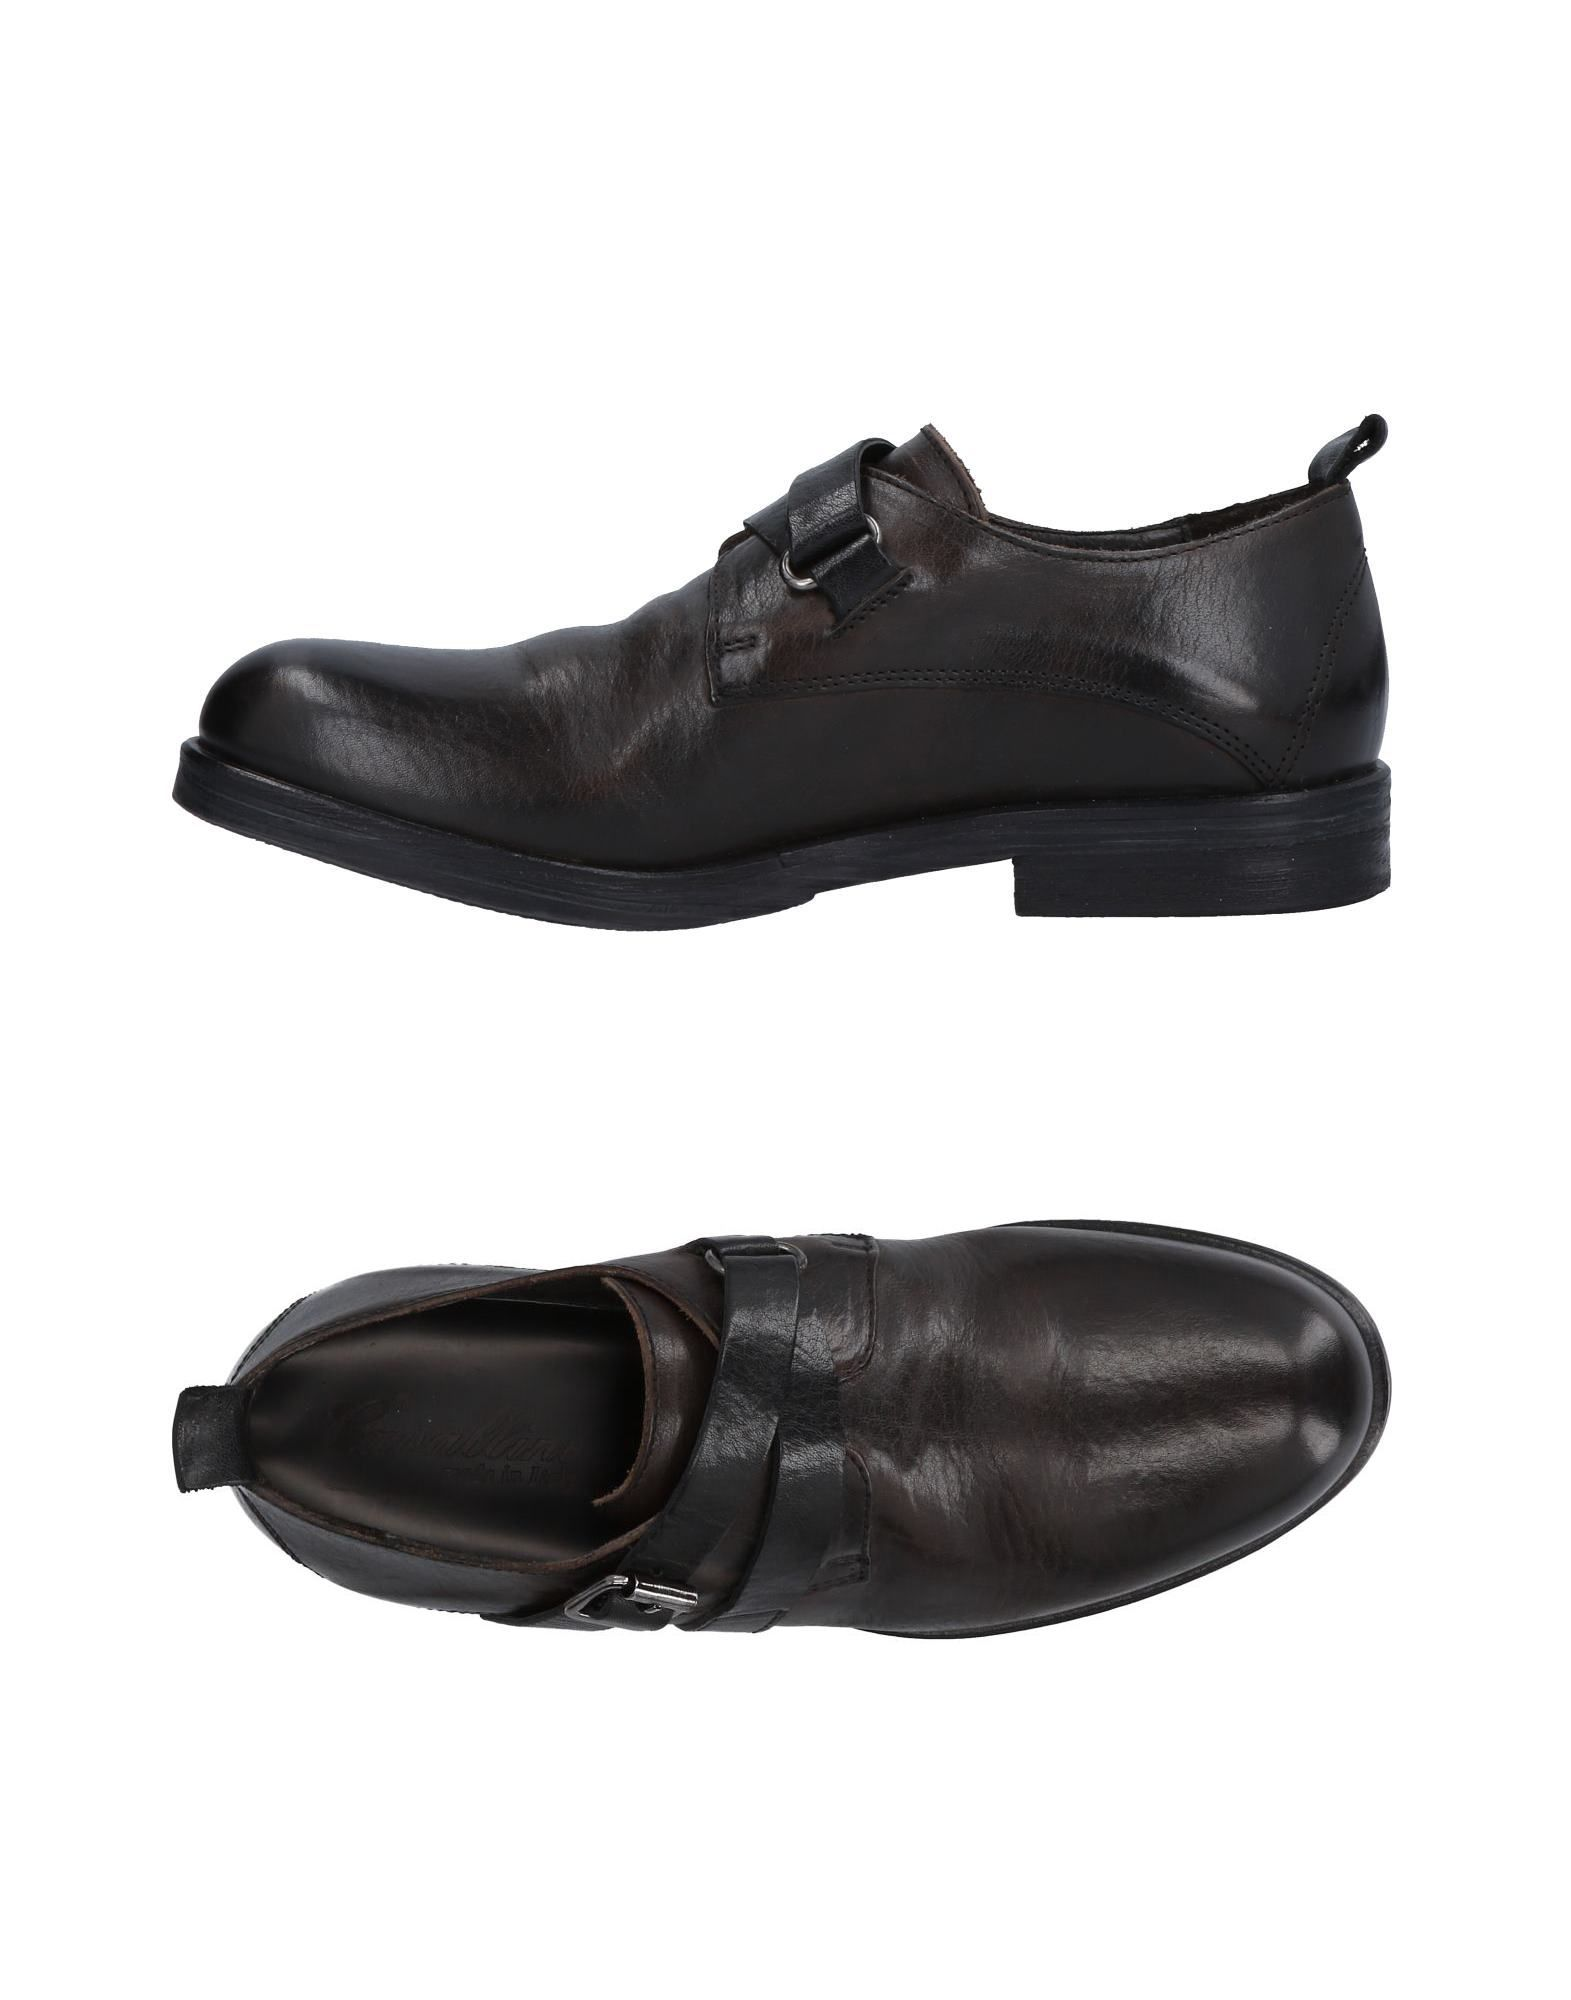 Cavallini Mokassins Damen  11496960NH Gute Qualität beliebte Schuhe